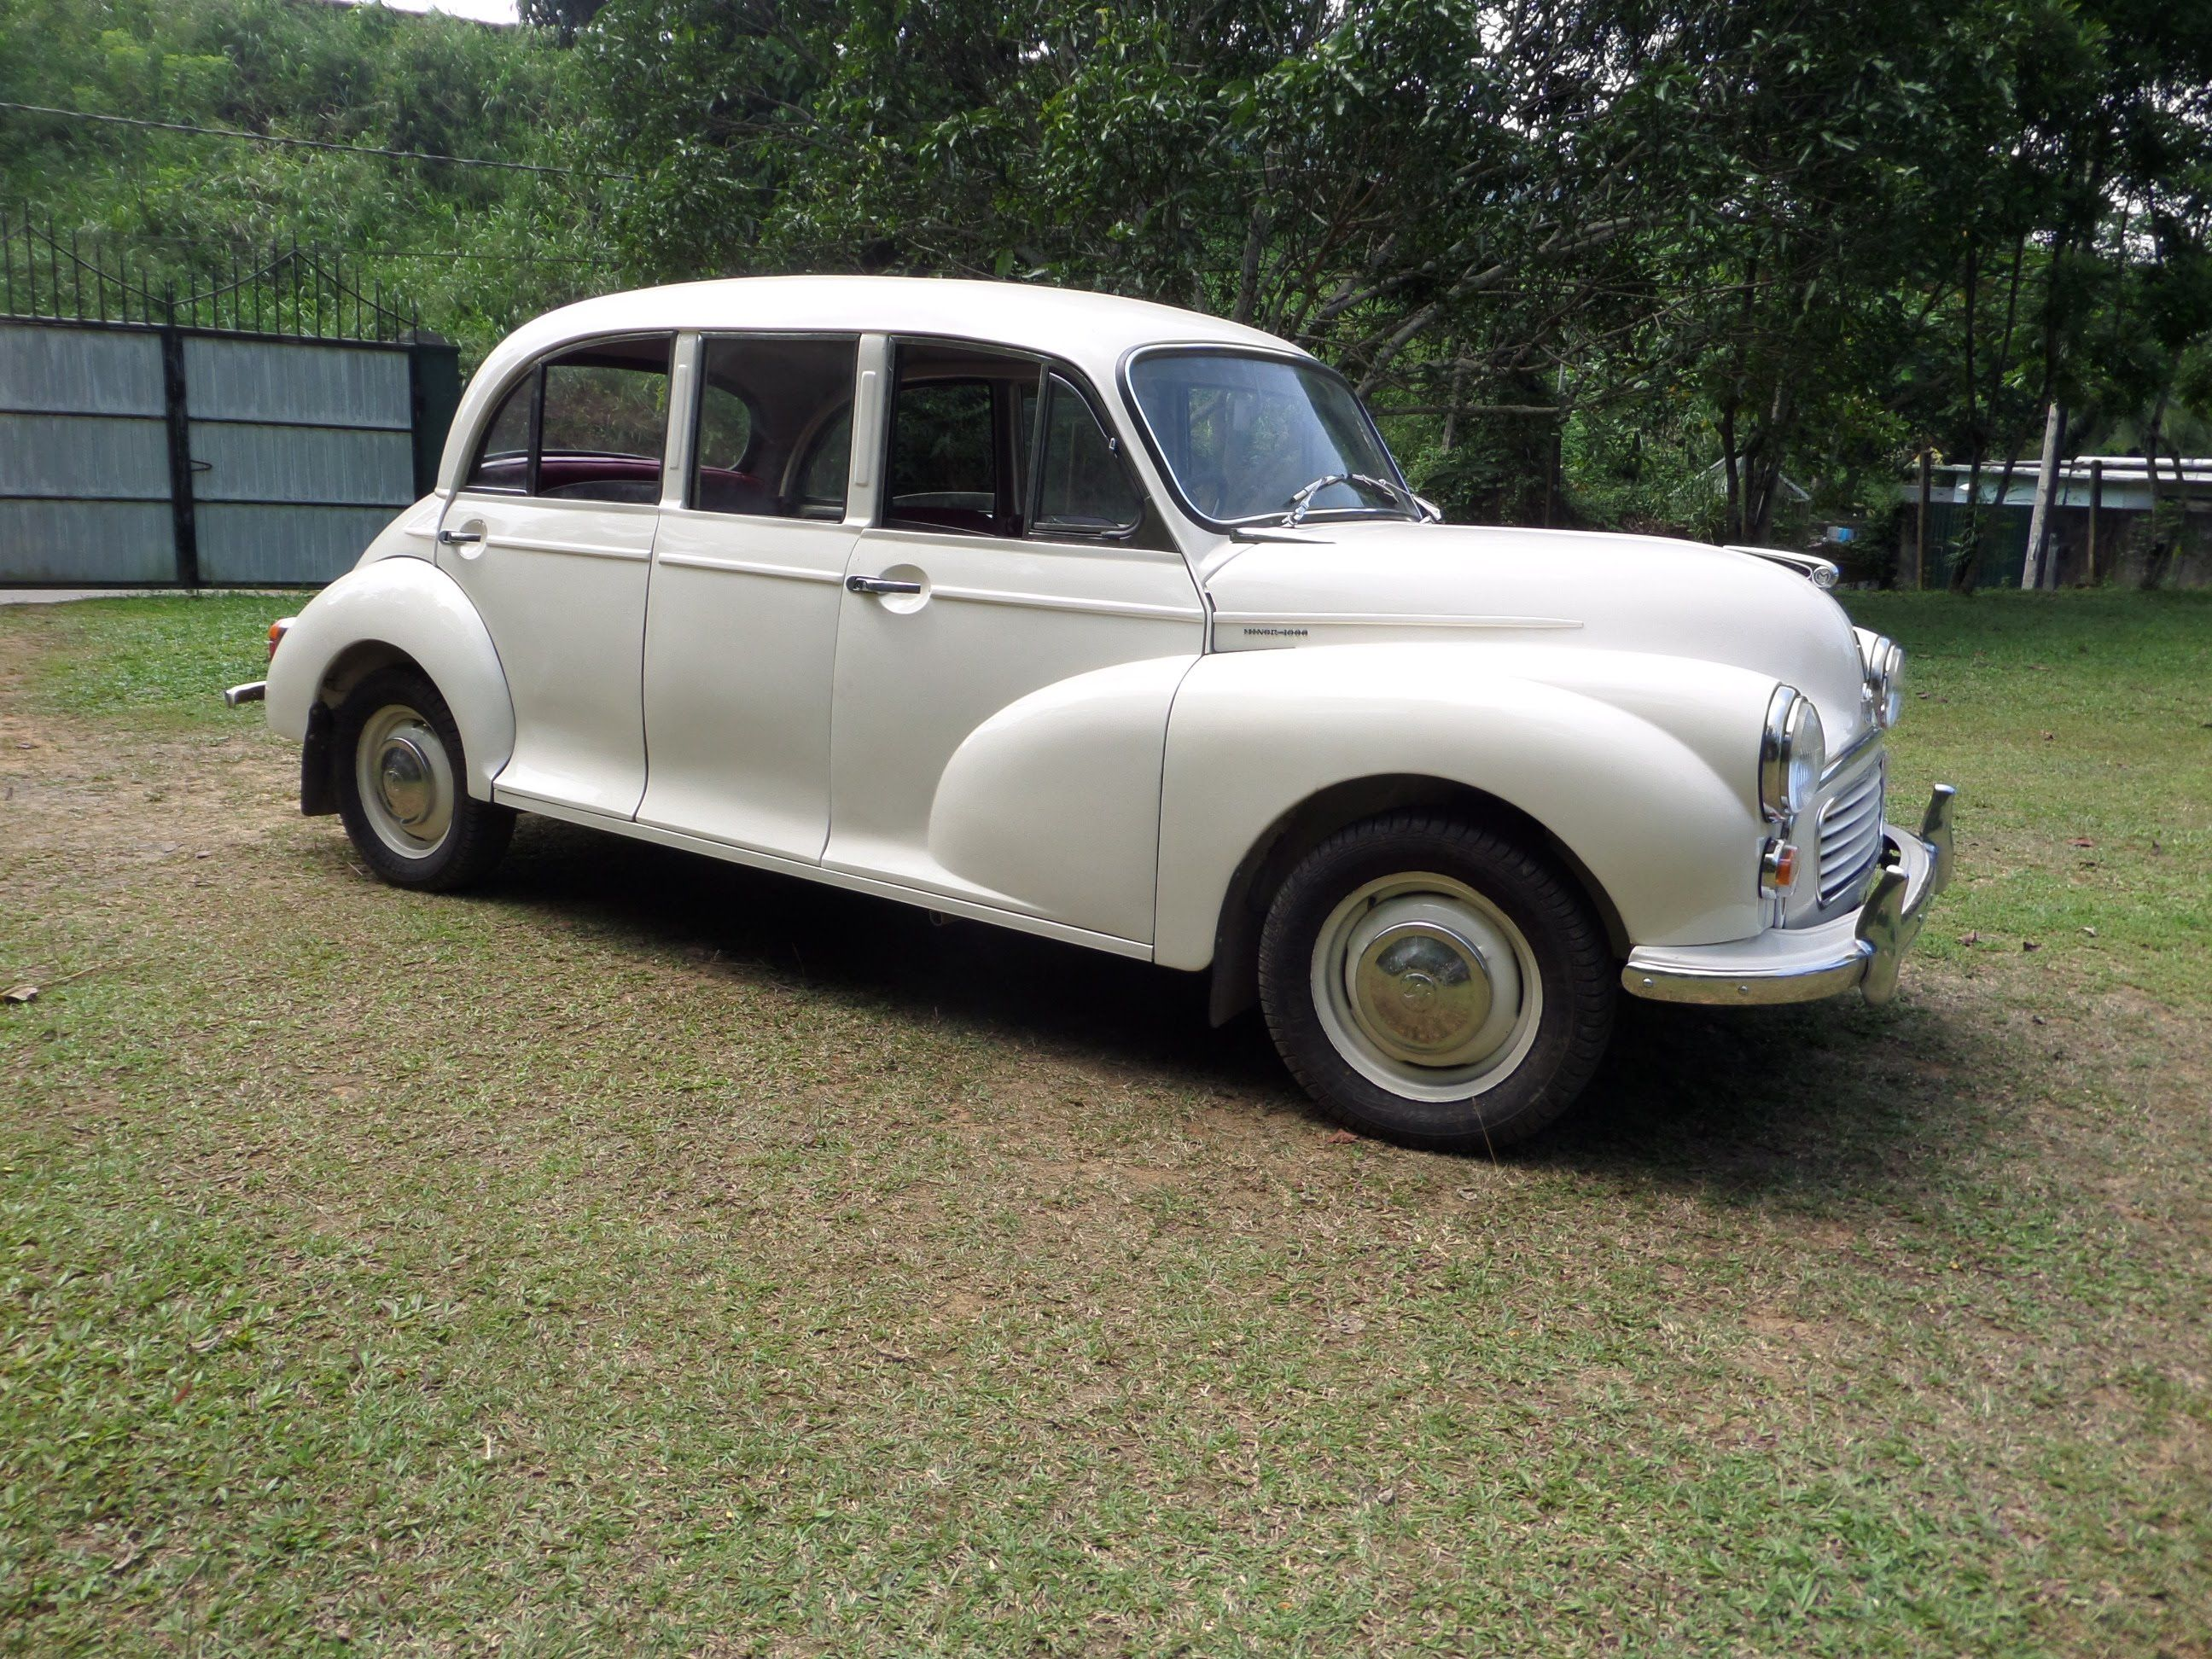 Morris Minor Limousine Trip Classic Car Club Of Ceylon Sri Lanka Morris Minor Classic Cars Classic Cars British